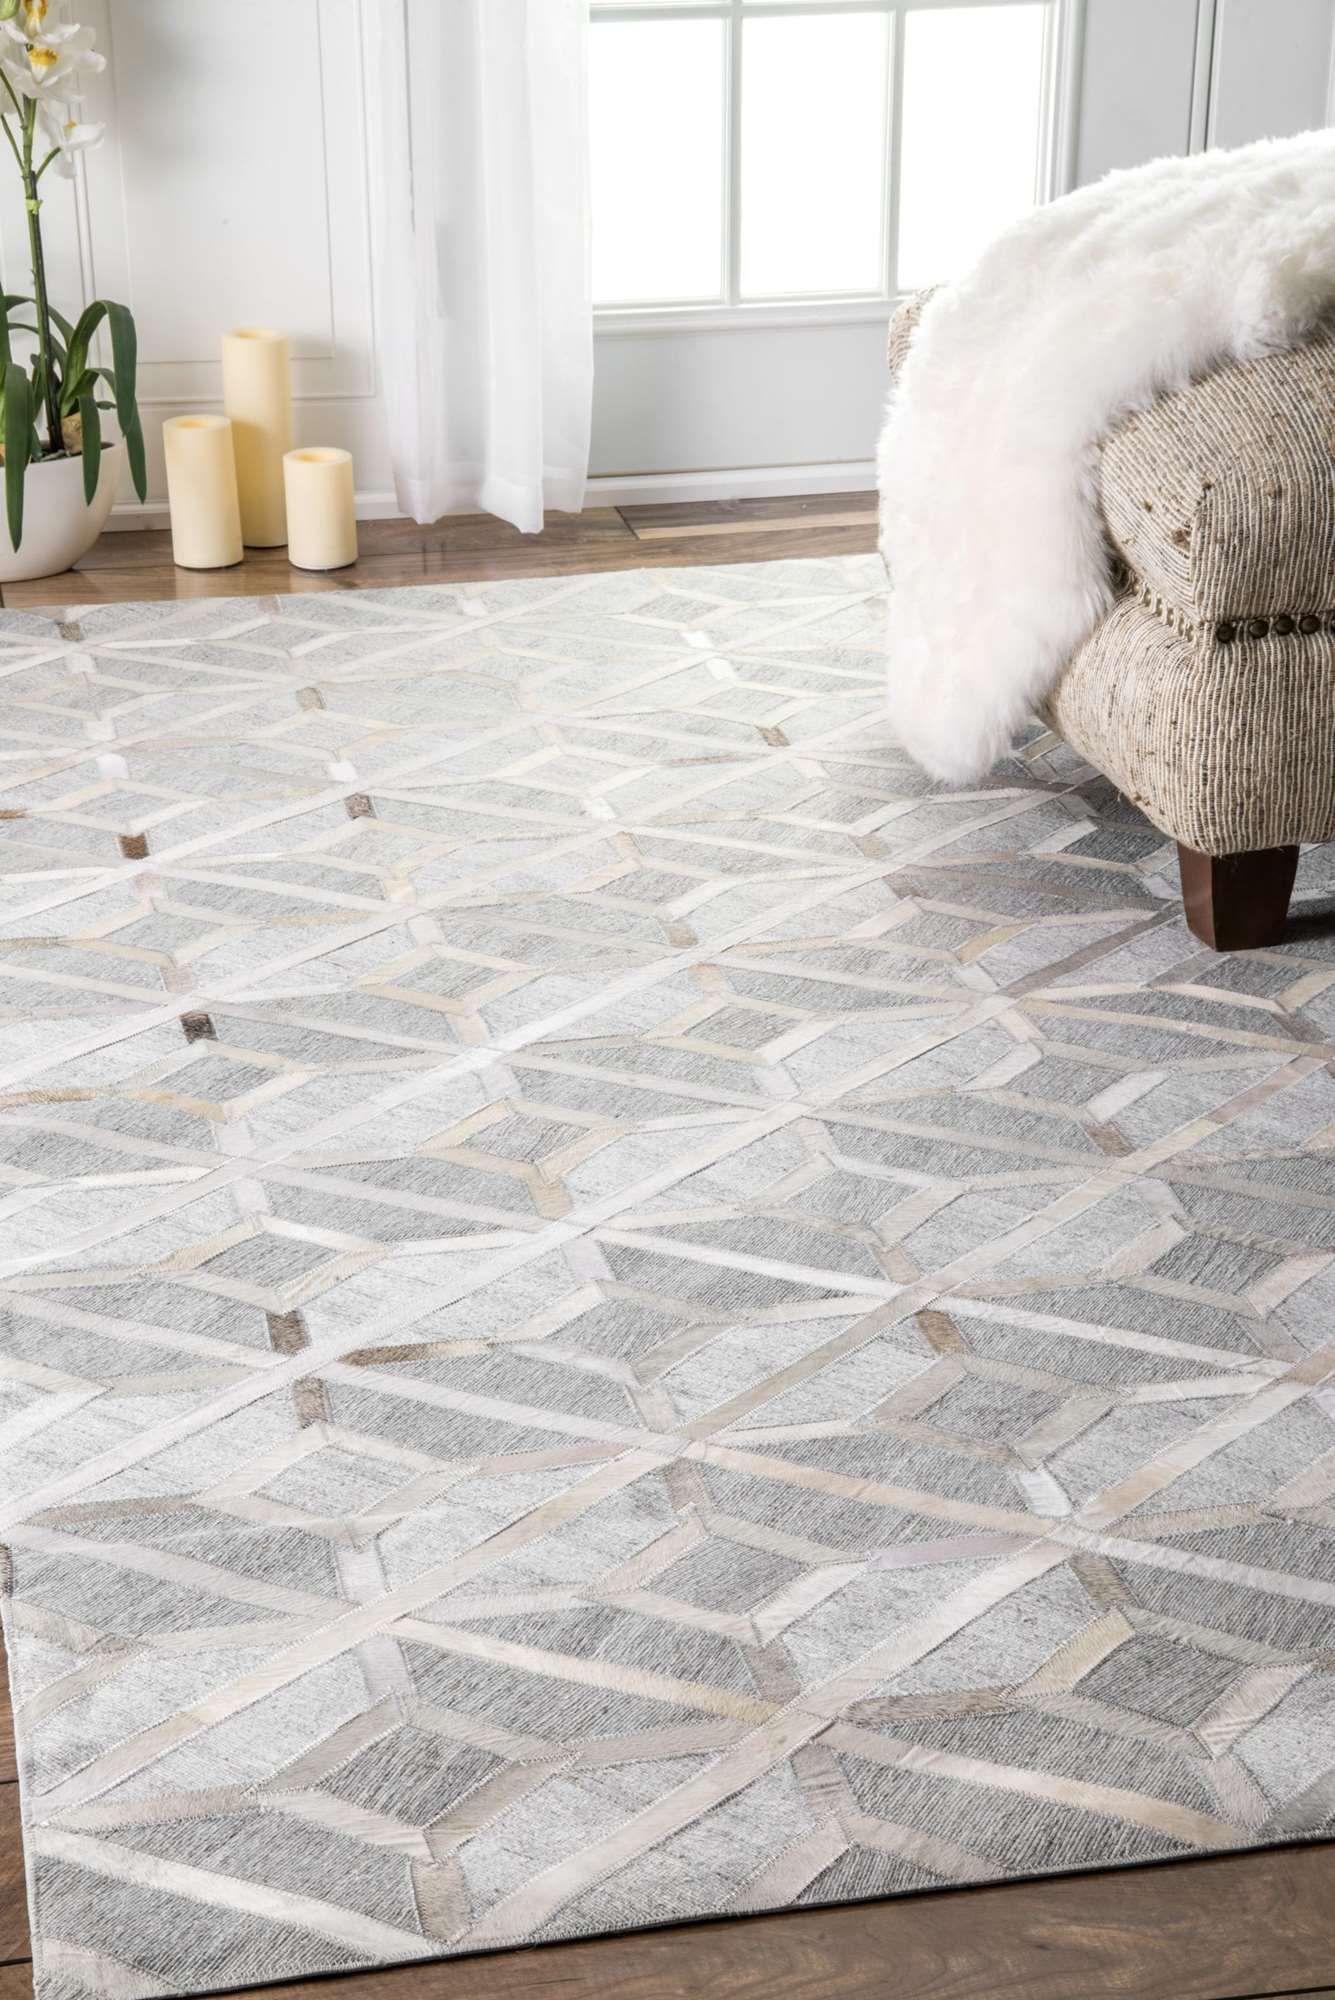 mandovicowhide diamond trellis rug  rugs usa shaggy rugs and  - mandovicowhide diamond trellis rug